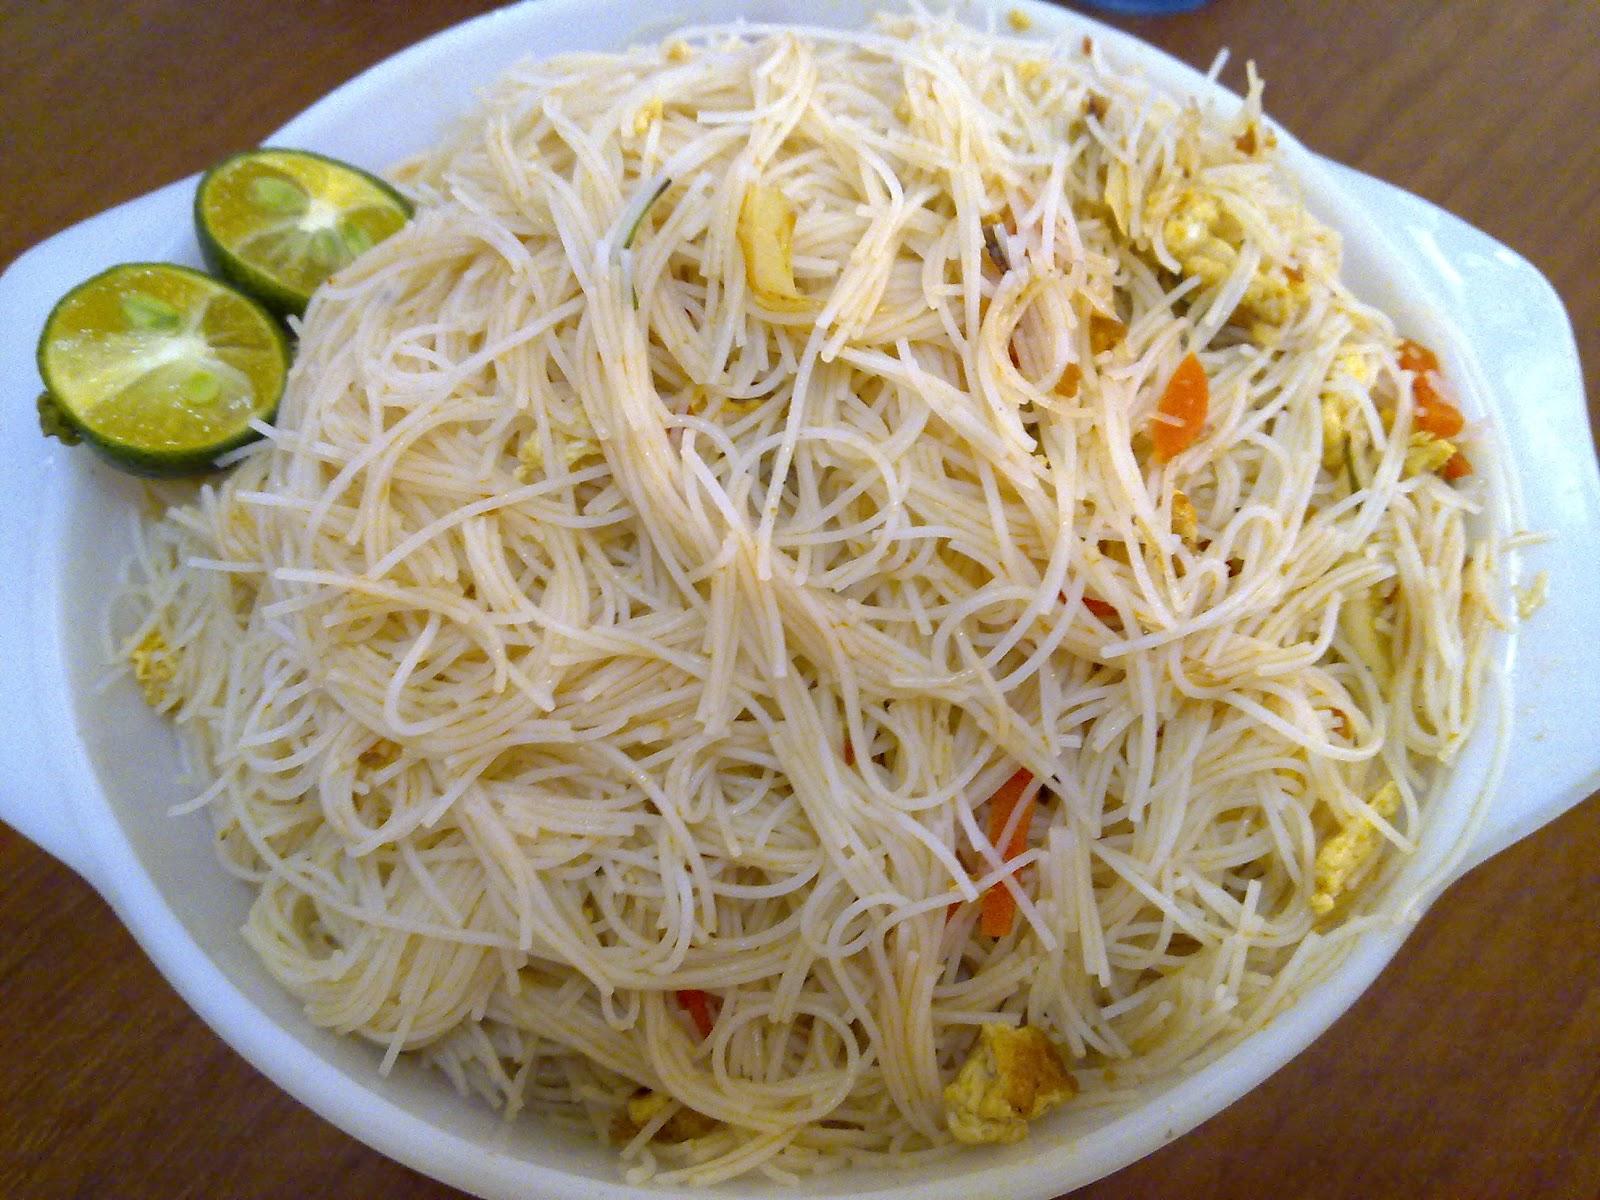 Peachpurple Hub: Spicy Tom Yam Rice Vermicelli( Tom Yam Beehoon)